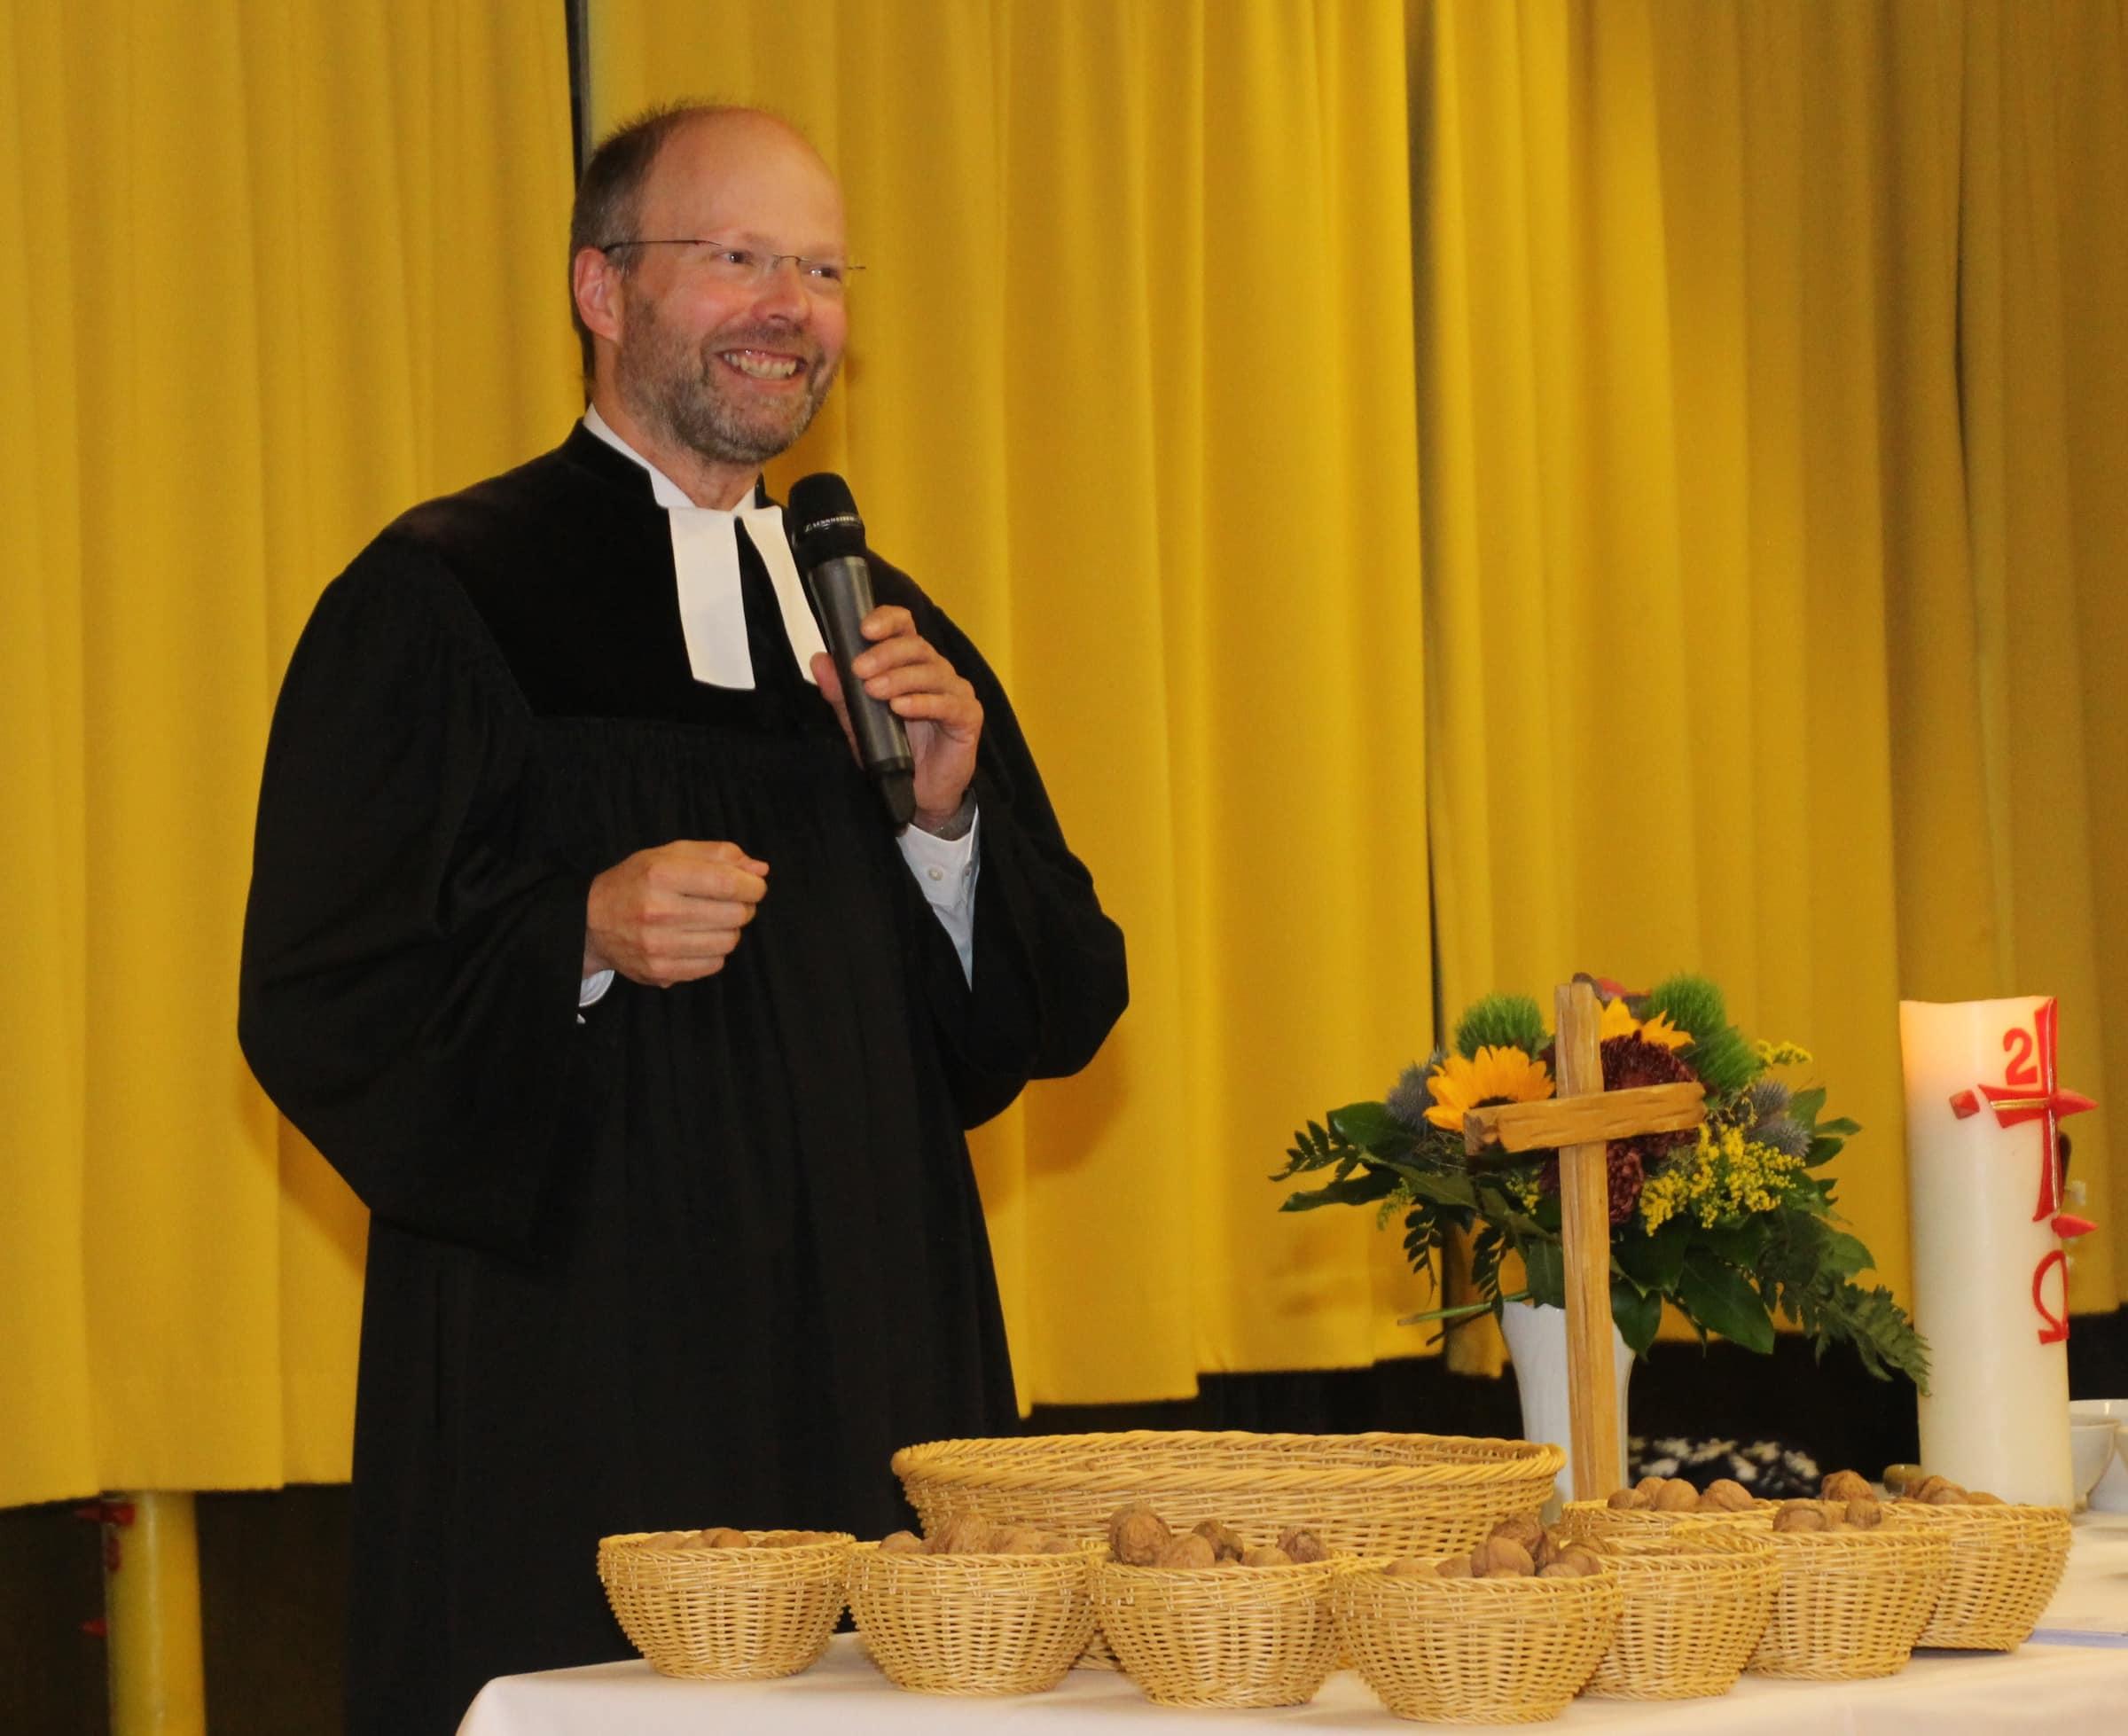 Pastor Christian Ratz